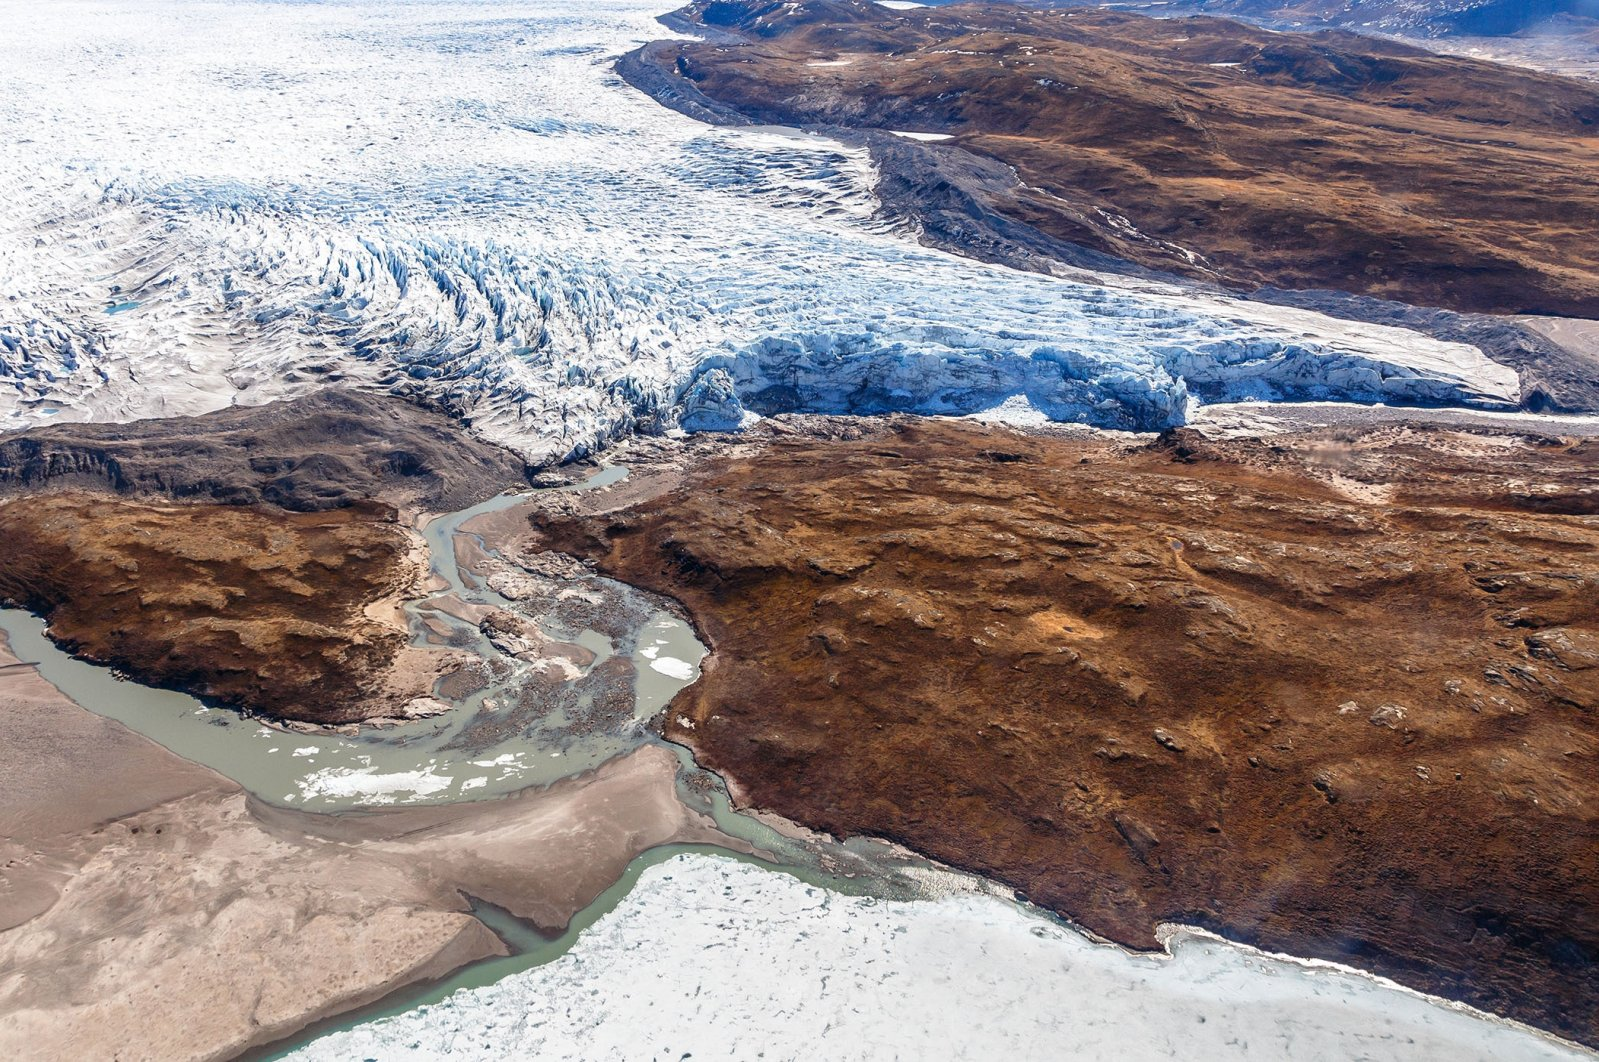 An aerial view shows theGreenlandic ice sheet, nearKangerlussuaq, Greenland. (Shutterstock Photo)